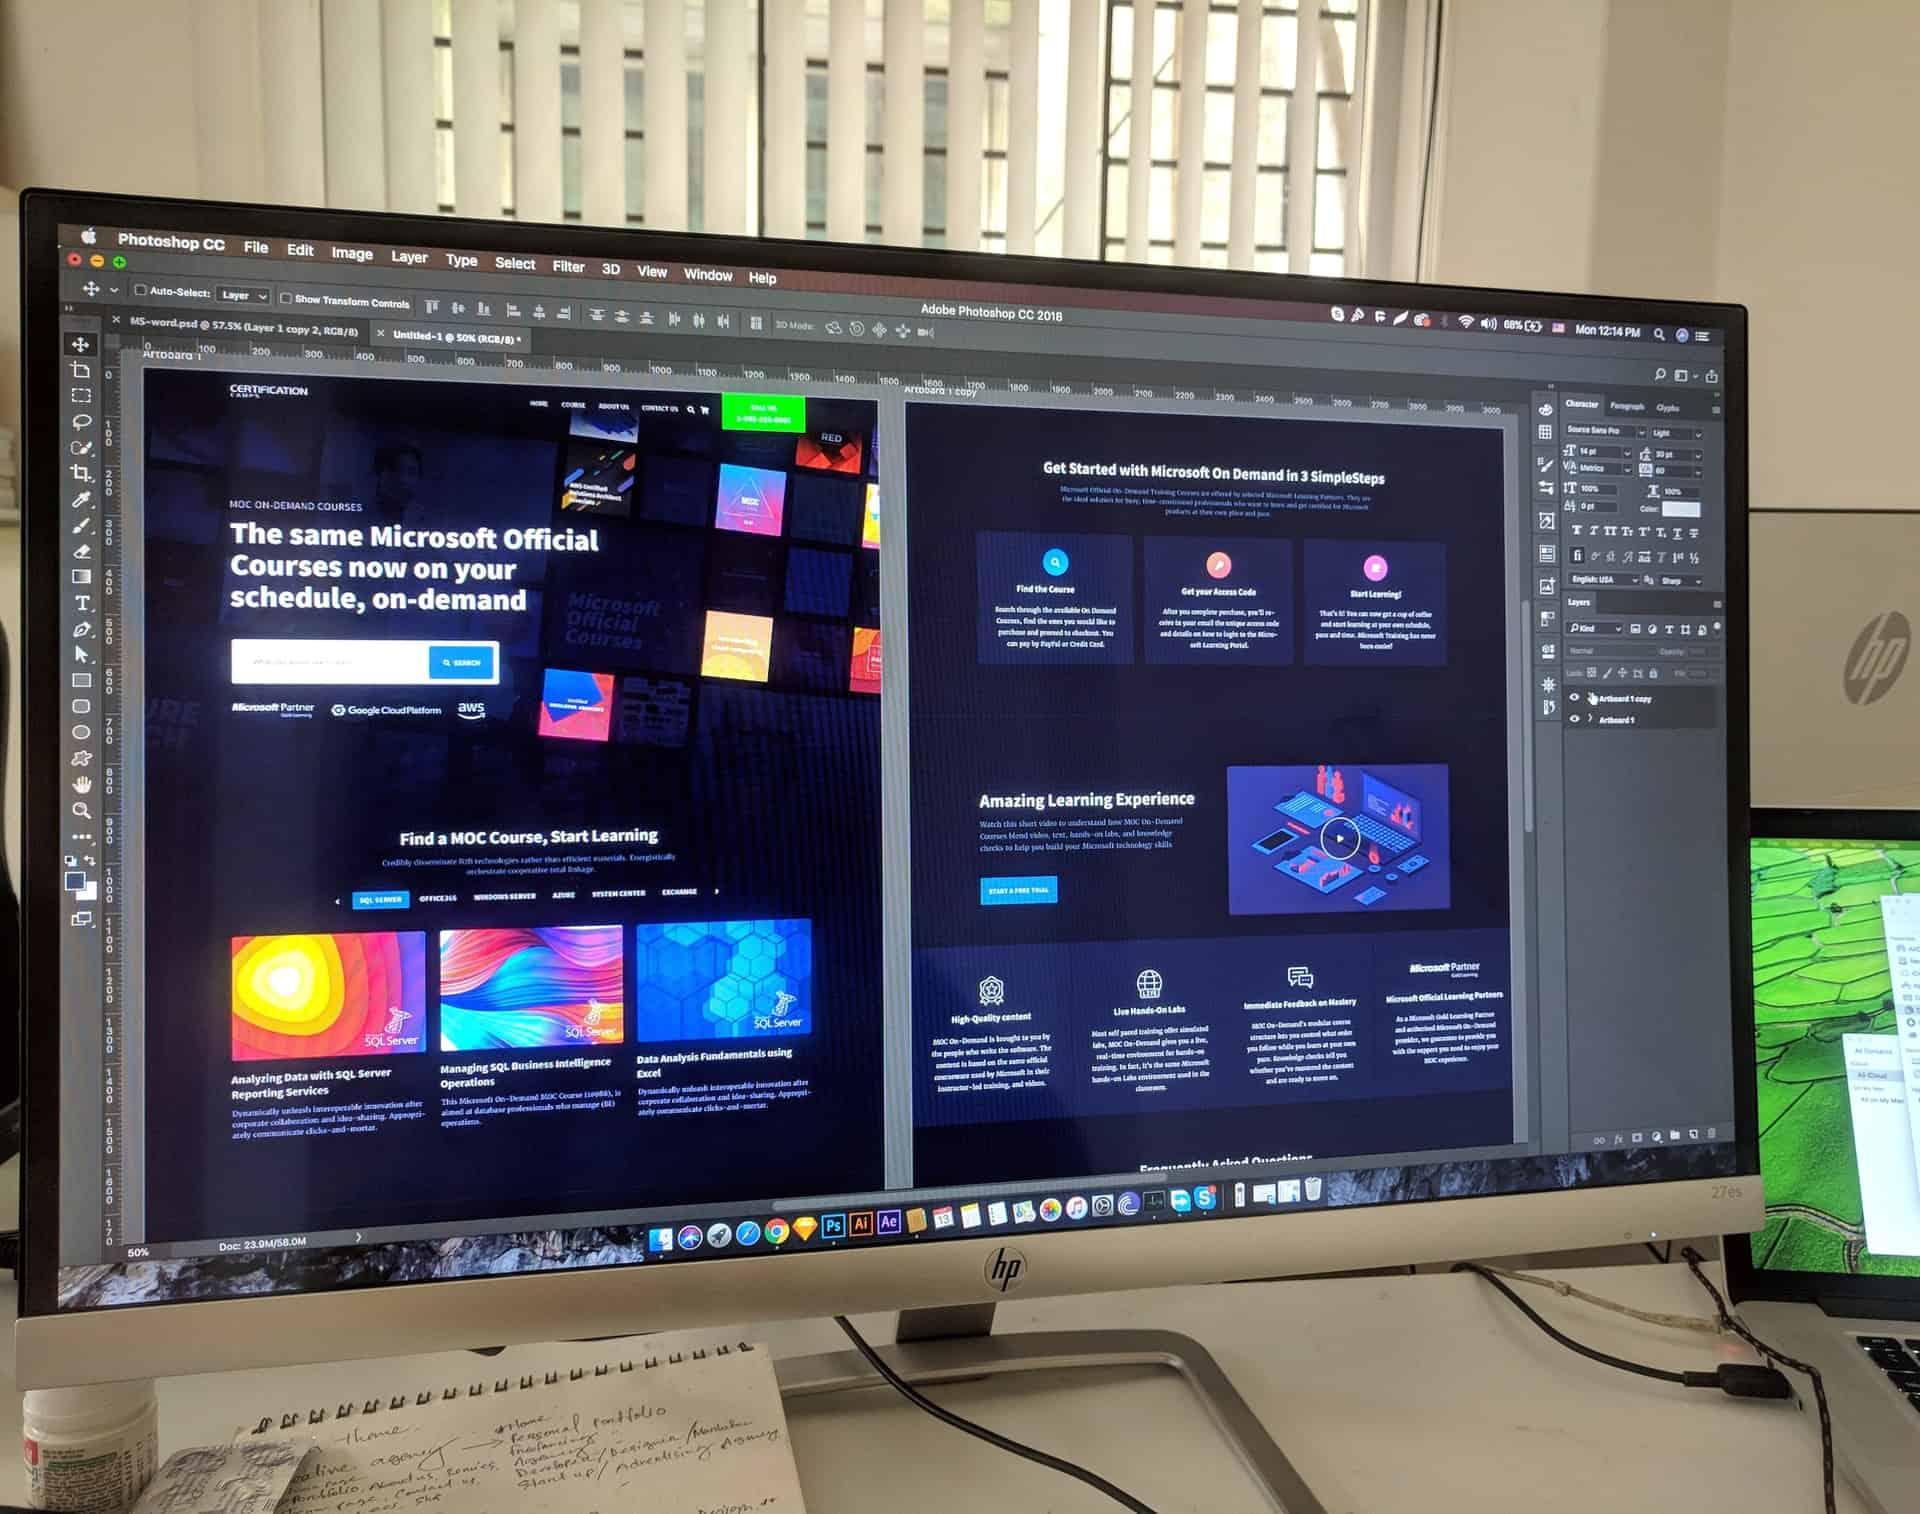 Website design in Photoshop